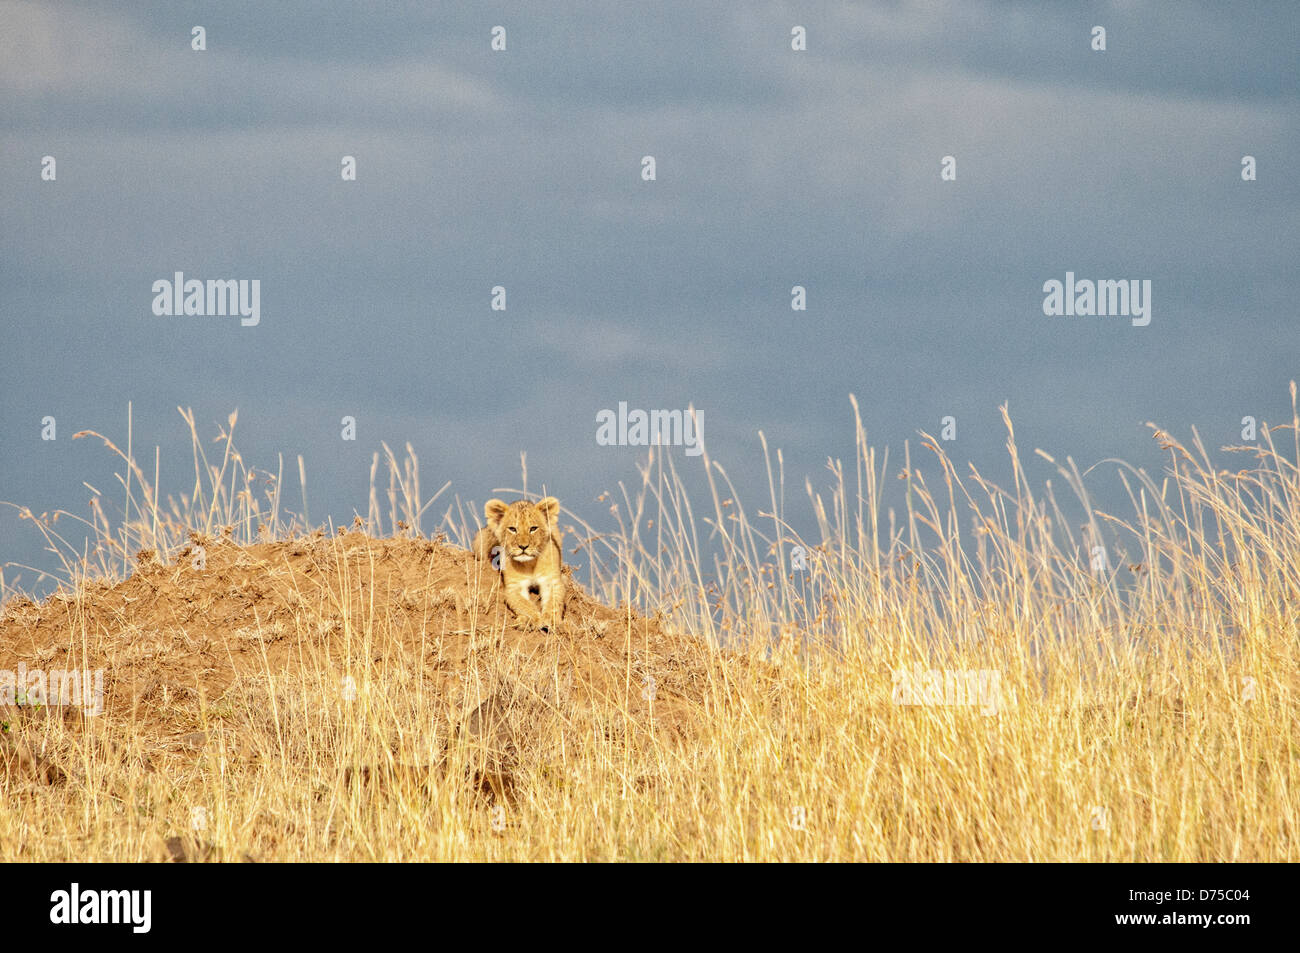 Small Lion Cub, Panthera leo, in tall grass, Masai Mara National Reserve, Kenya, Africa Stock Photo